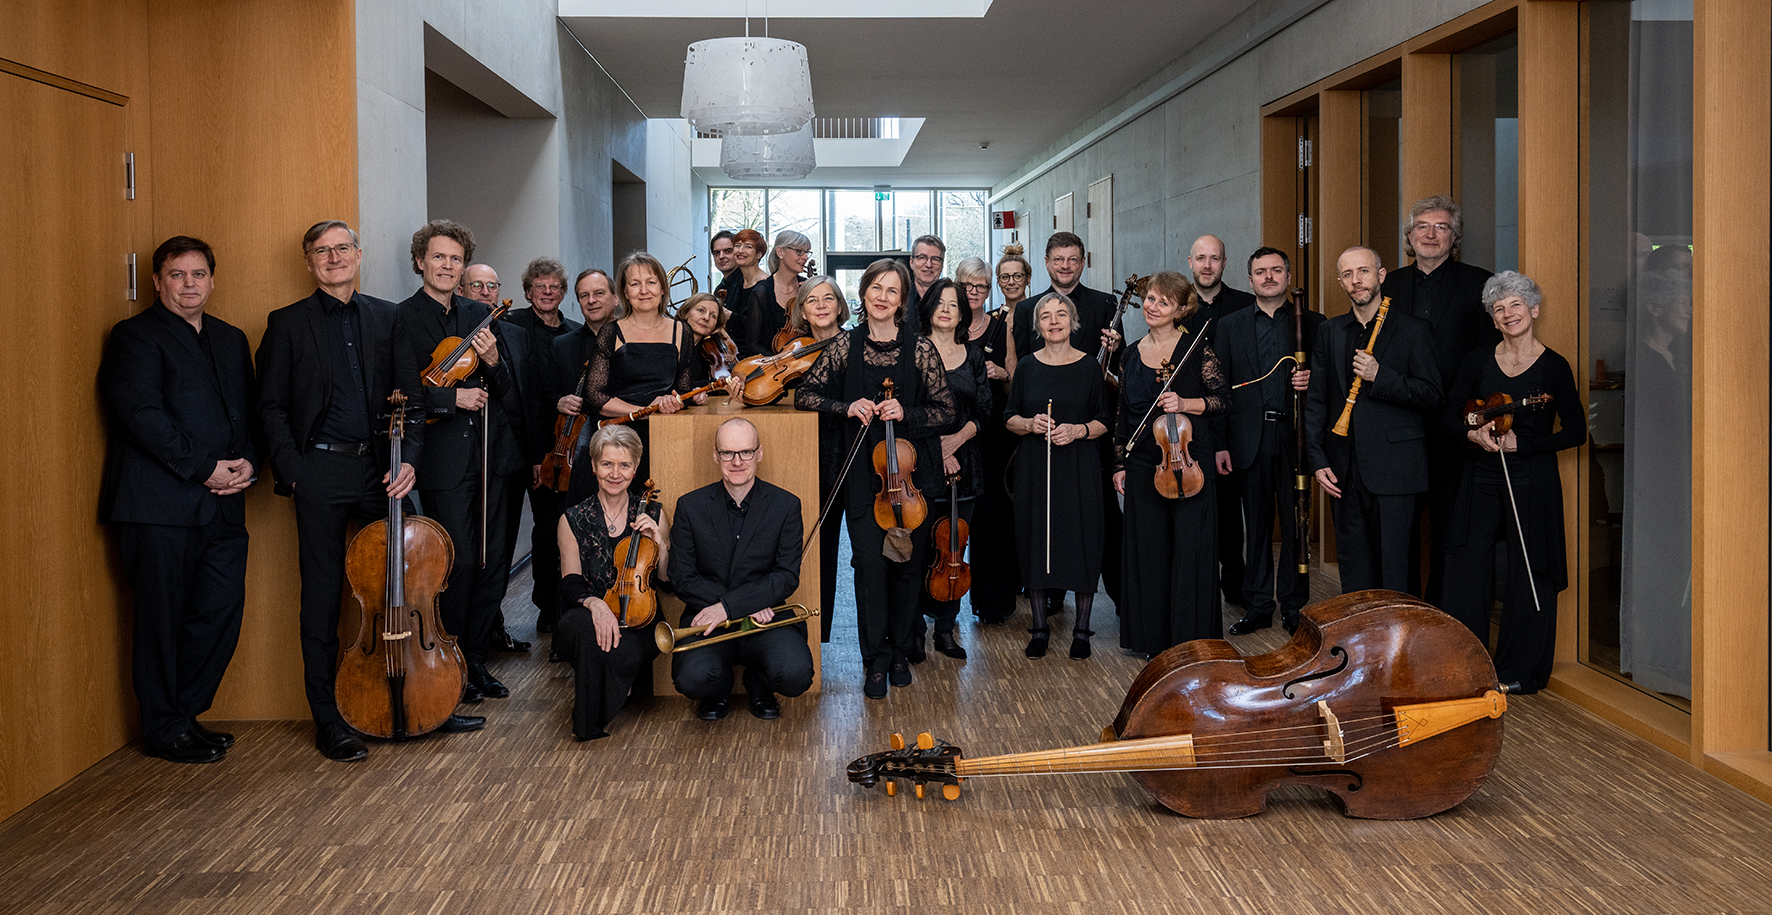 Orquesta Barroca de Friburgo ©Britt Schilling